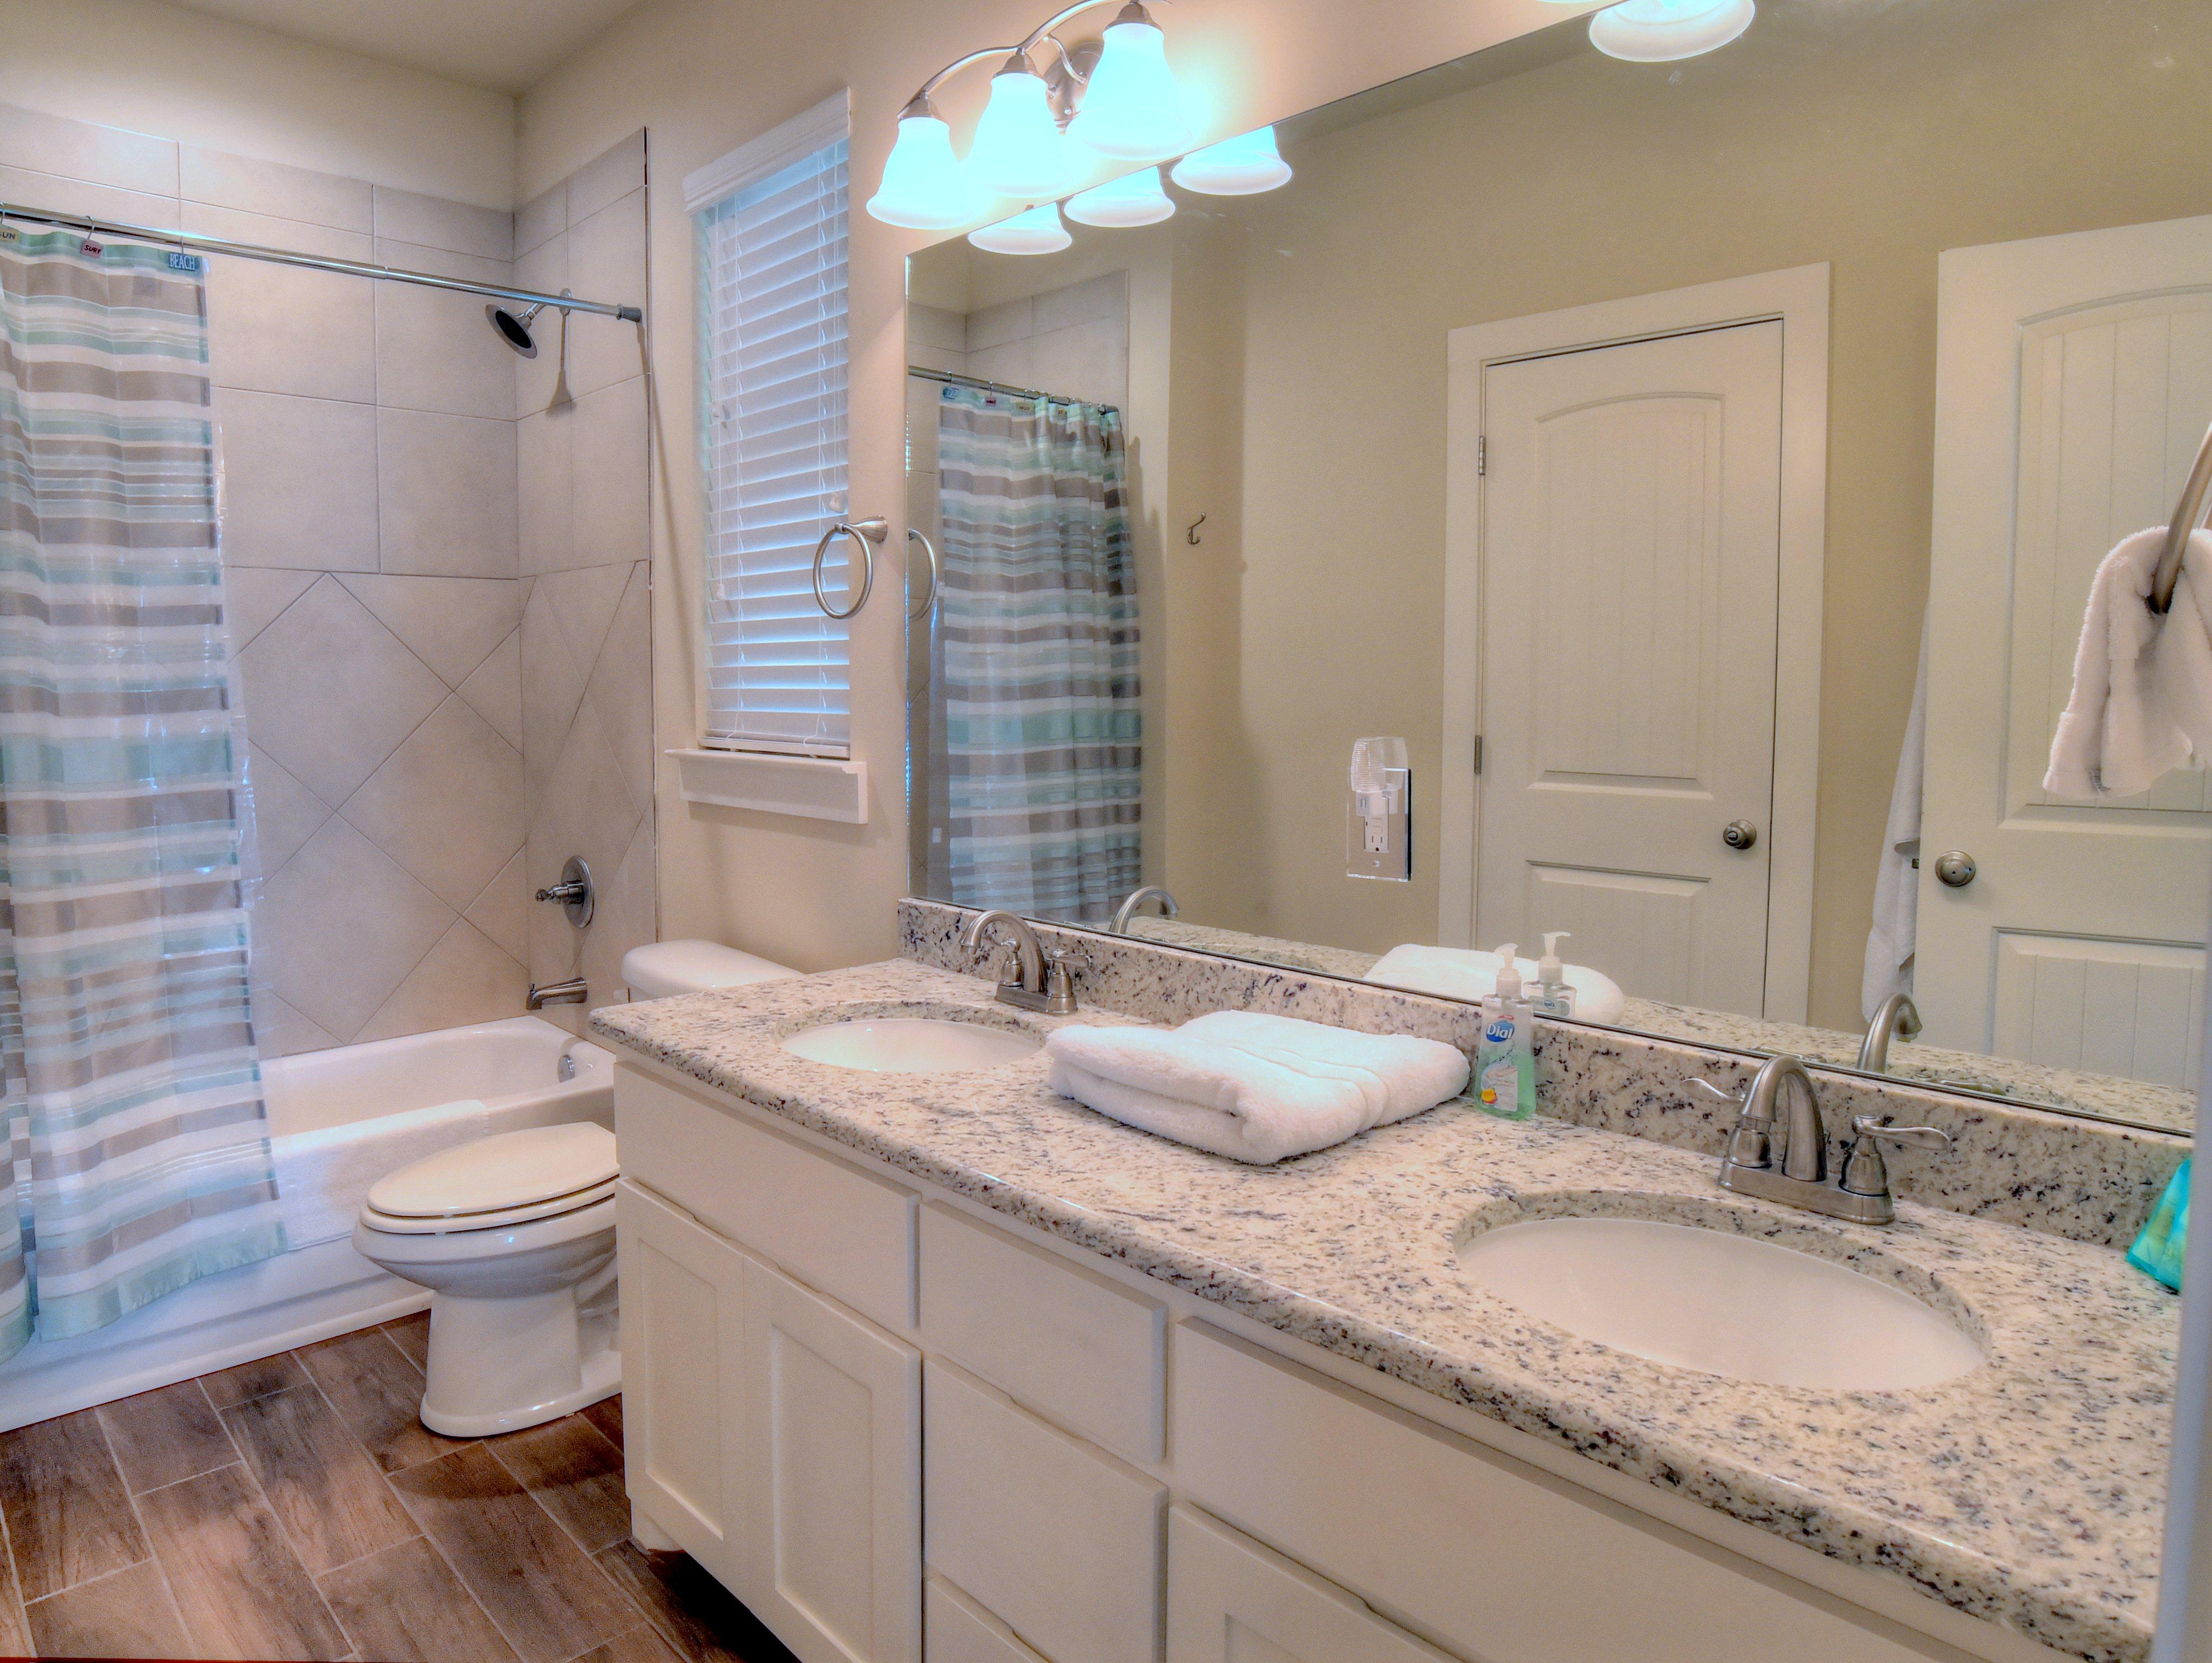 93 Beacon Point Condo rental in Sandestin Rentals ~ Cottages and Villas  in Destin Florida - #27